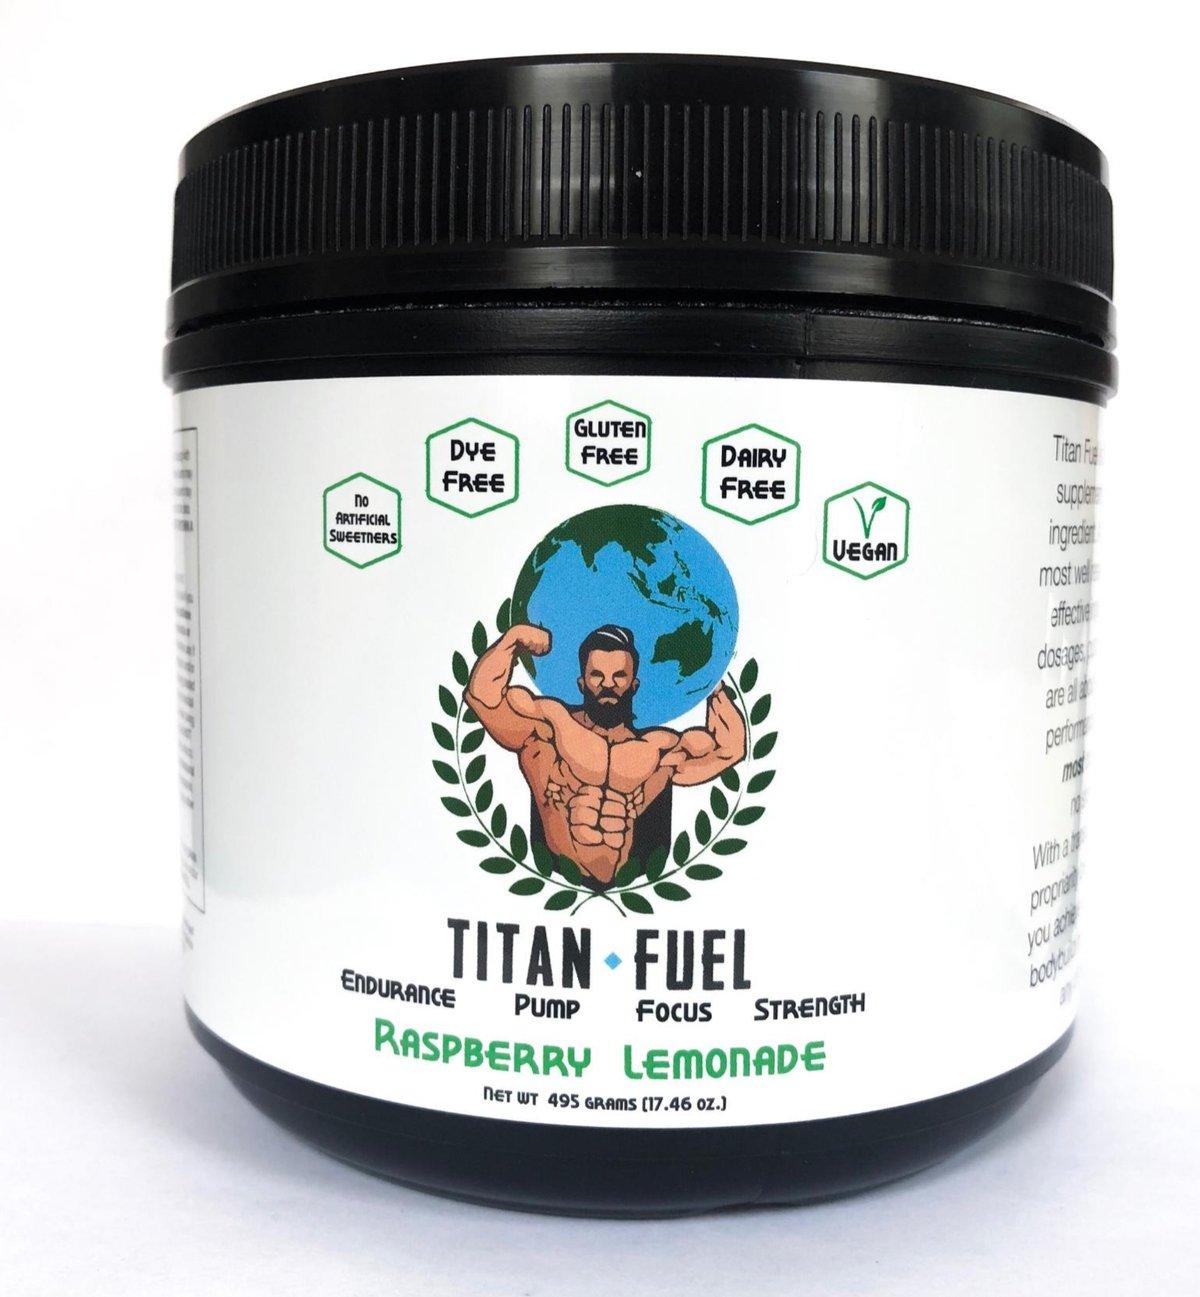 Image of Titan Fuel Pre-Workout Raspberry Lemonade